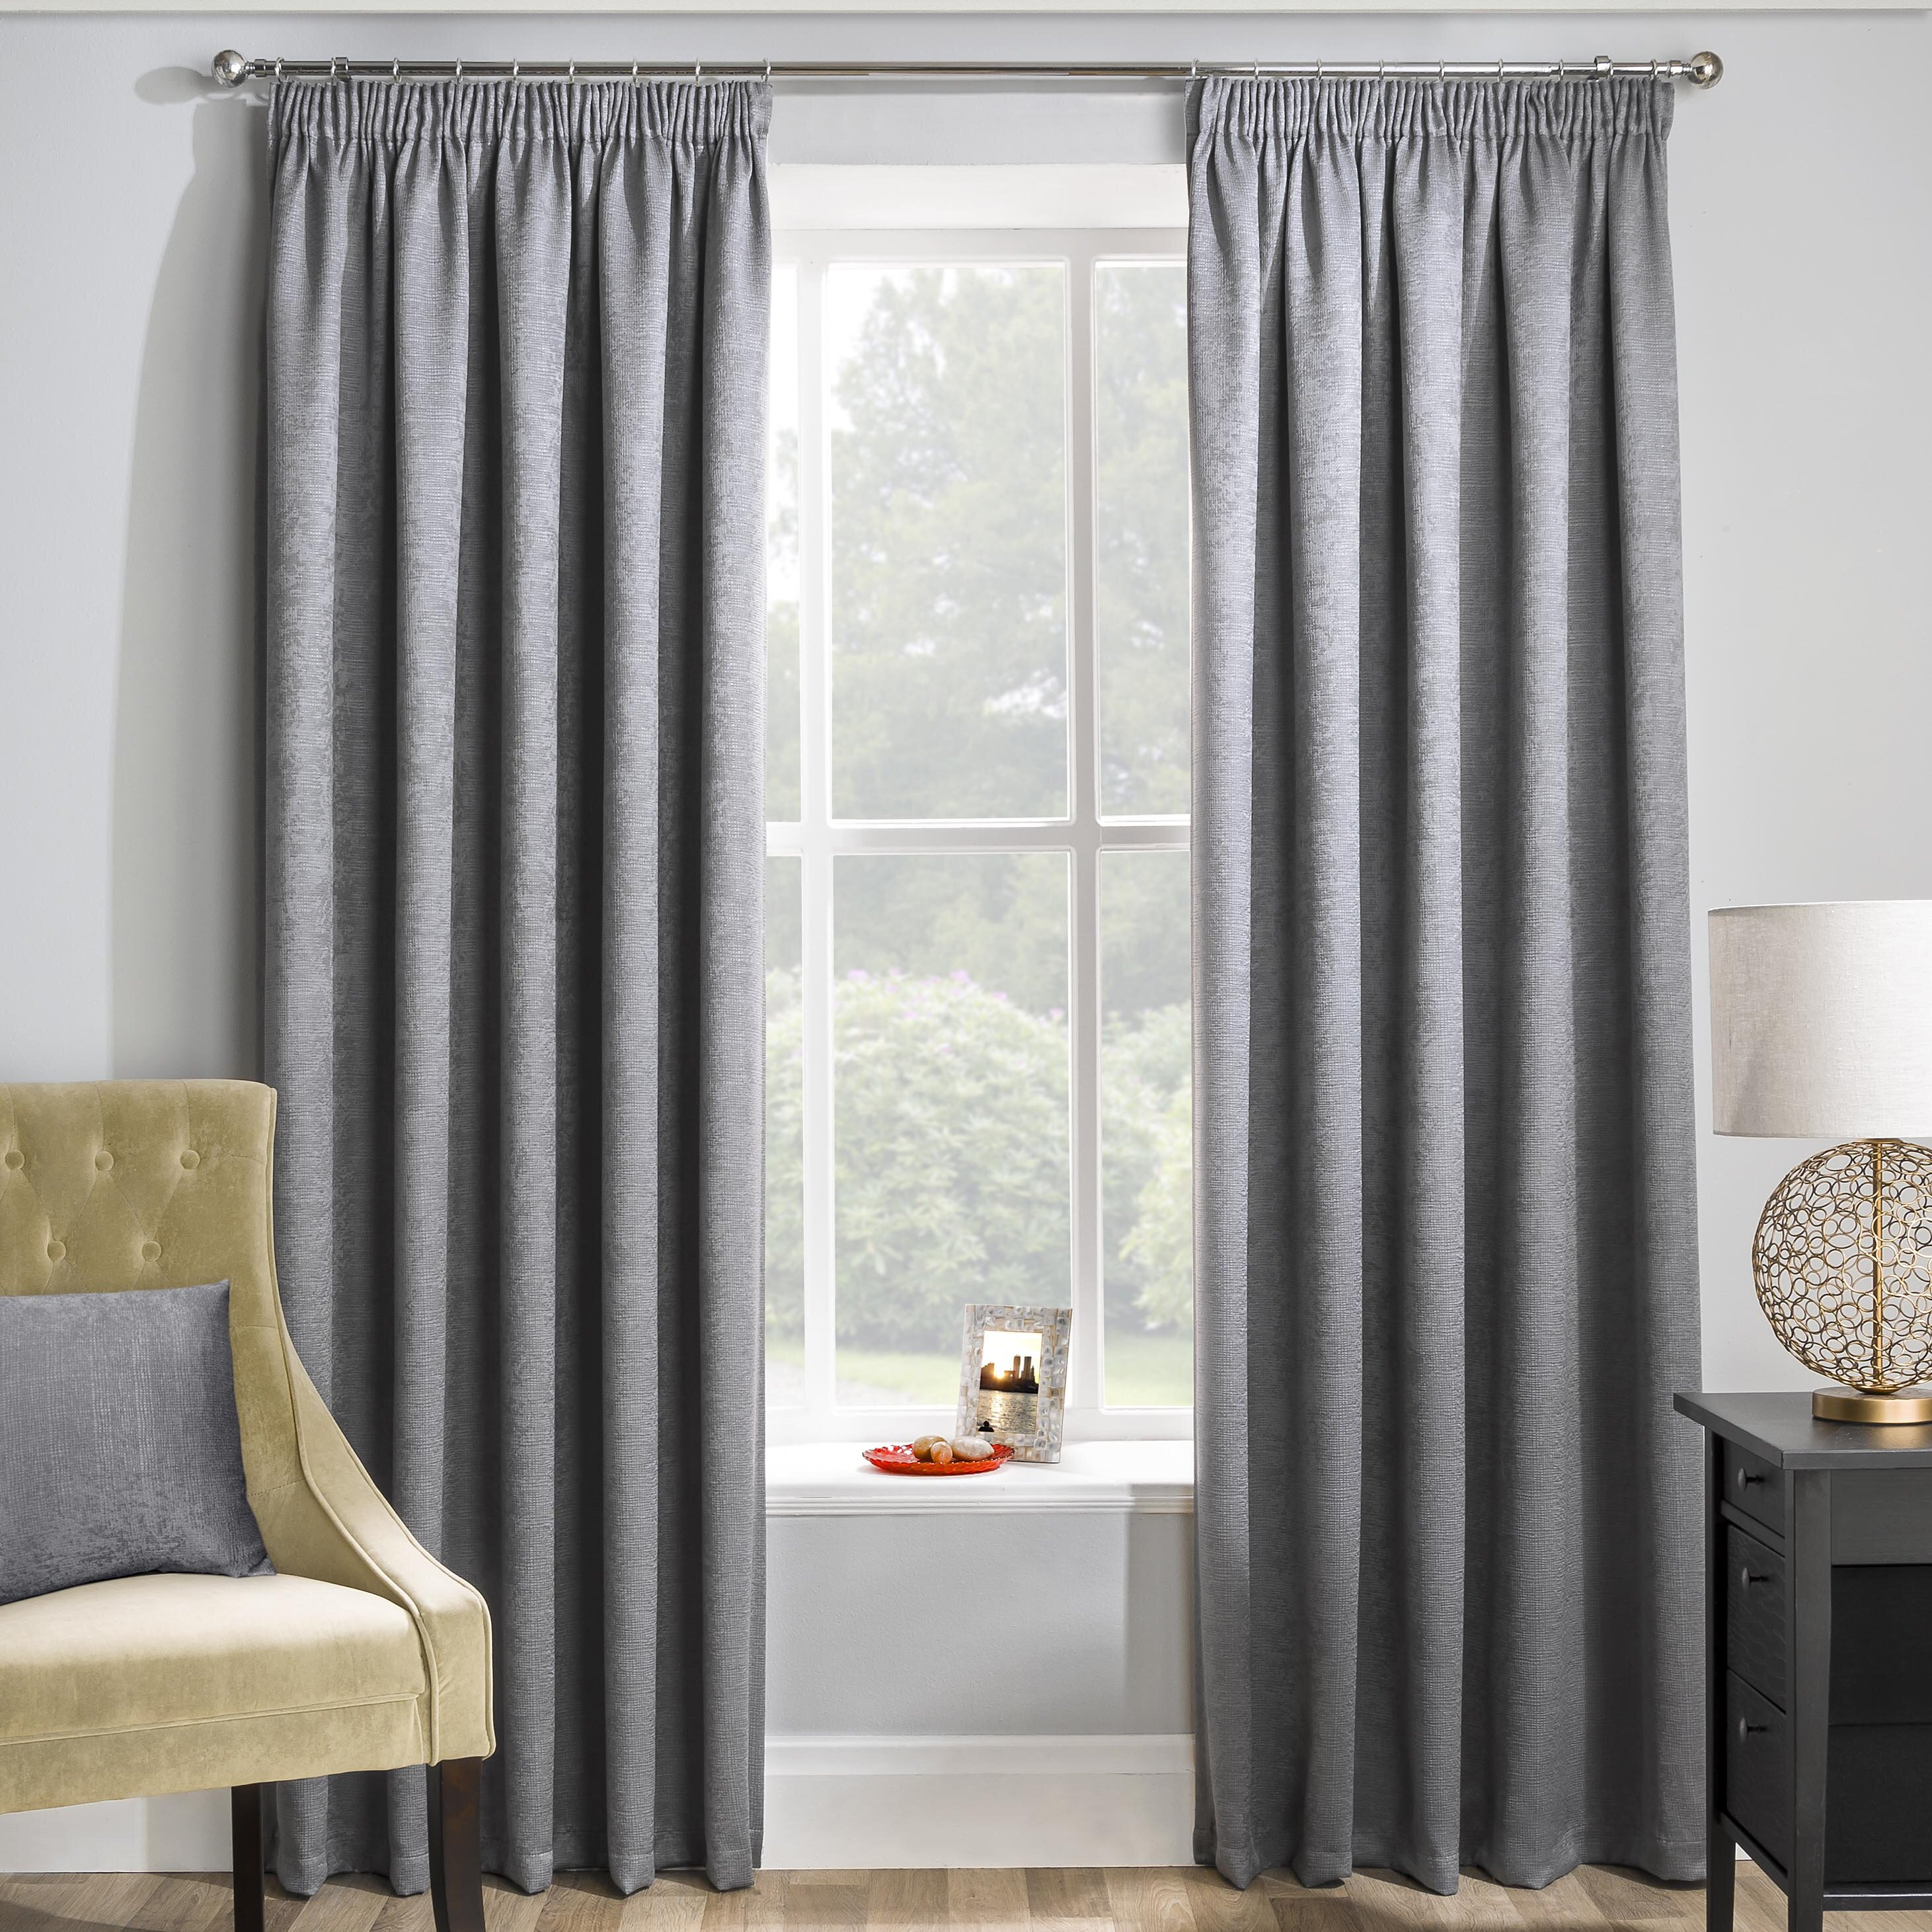 Three Posts Armington Pencil Pleat Room Darkening Thermal Curtains Reviews Wayfair Co Uk